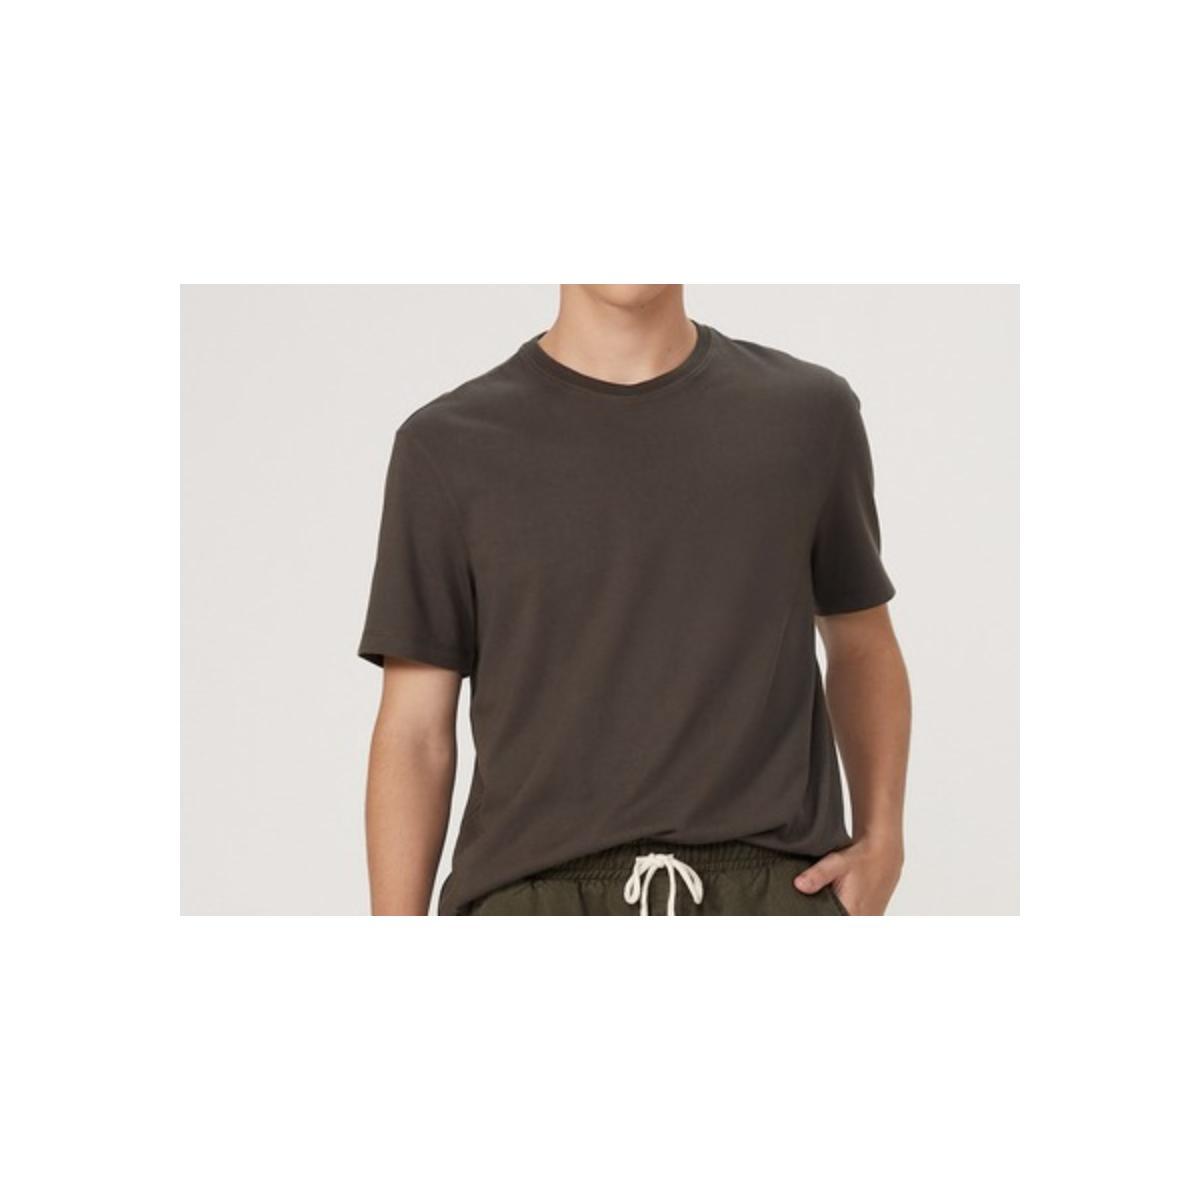 Camiseta Masculina Hering 0201 Naten Verde